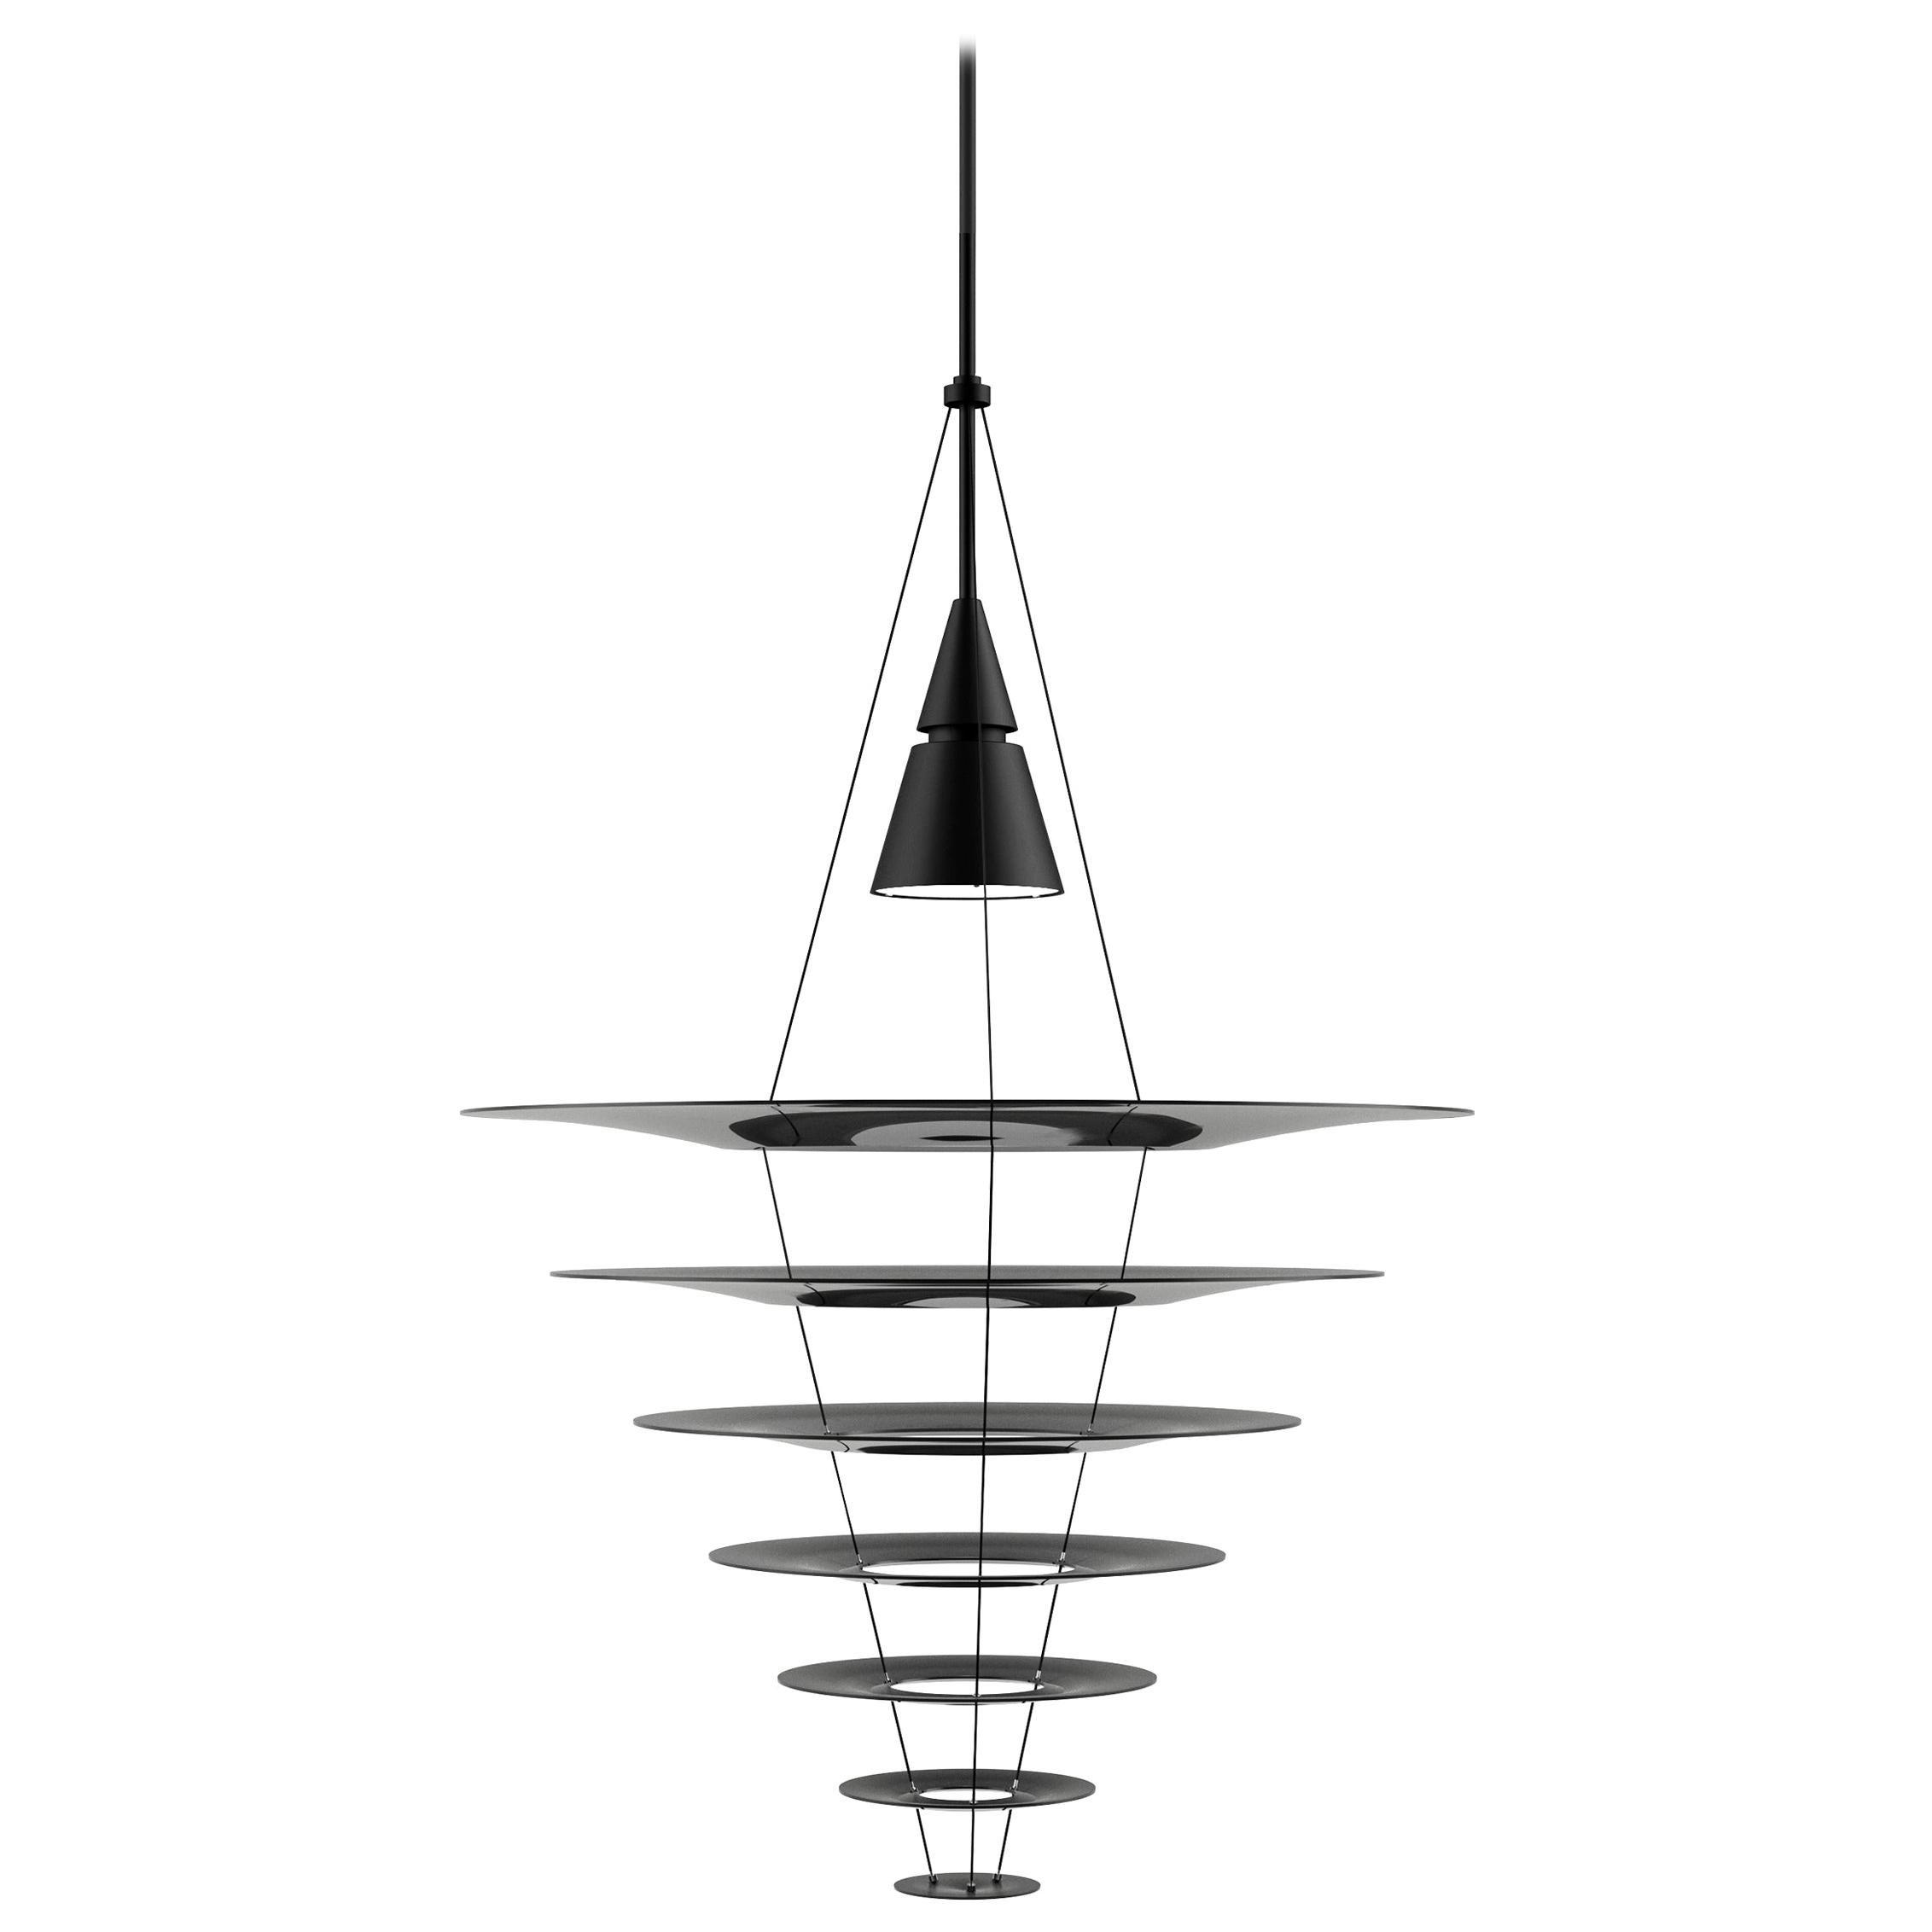 Louis Poulsen Large Enigma Pendant Lamp by Shoichi Uchiyama